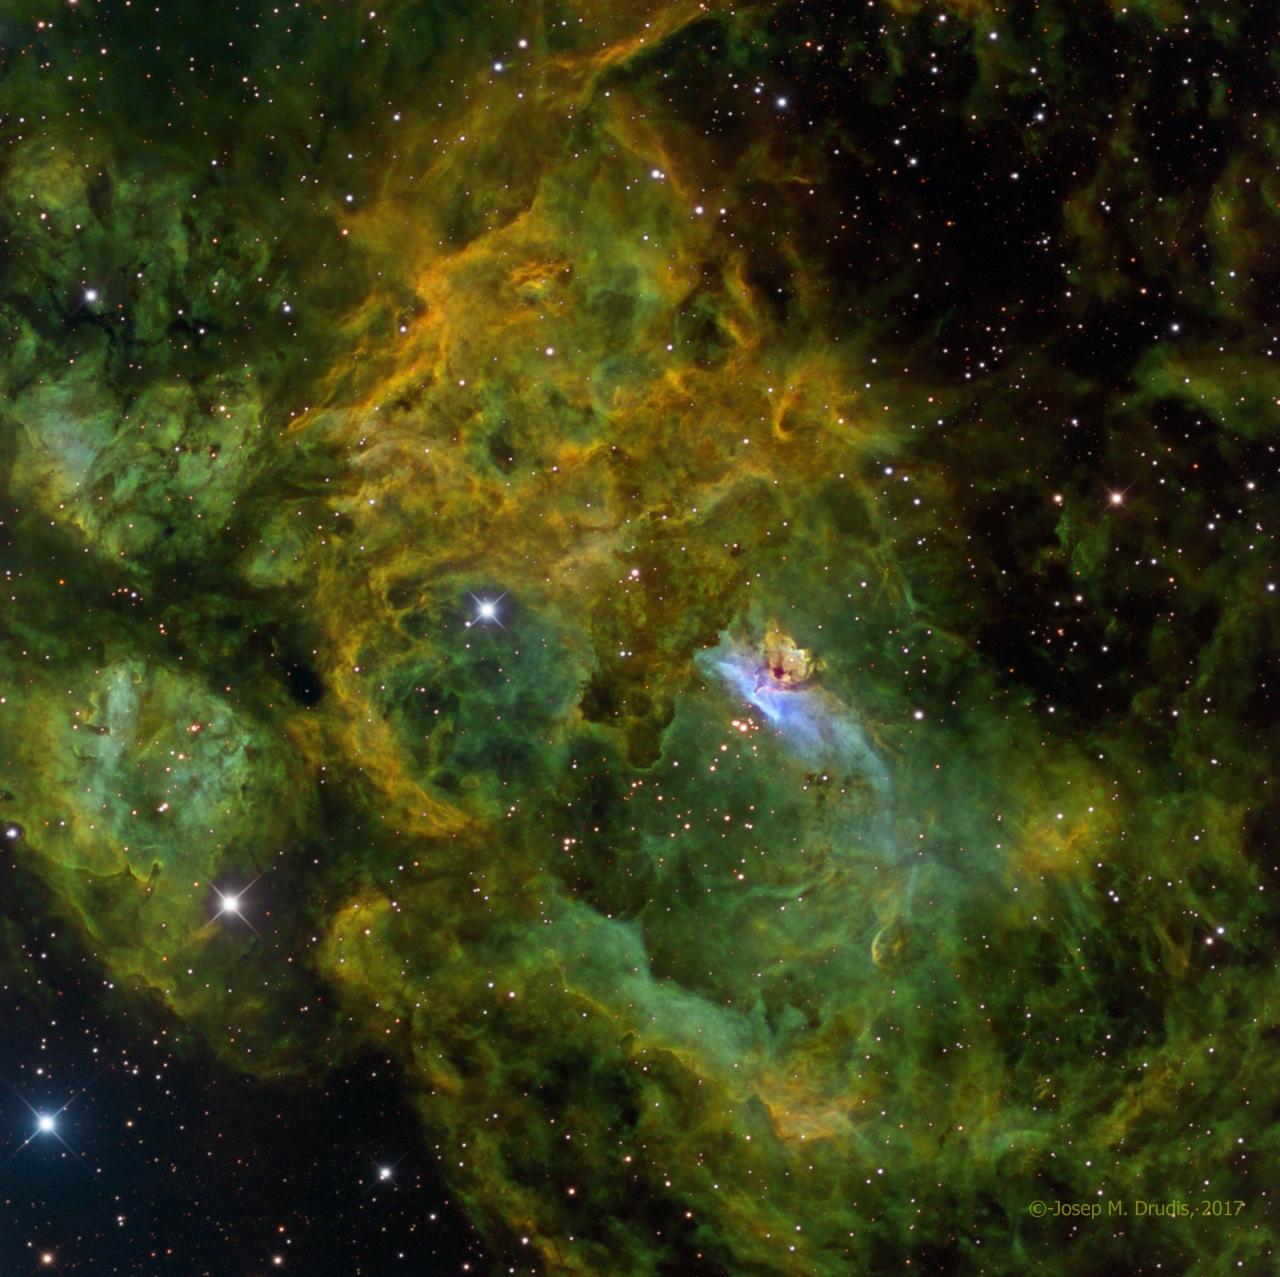 NGC6357-SLha-HCP-07-Final3-Cc